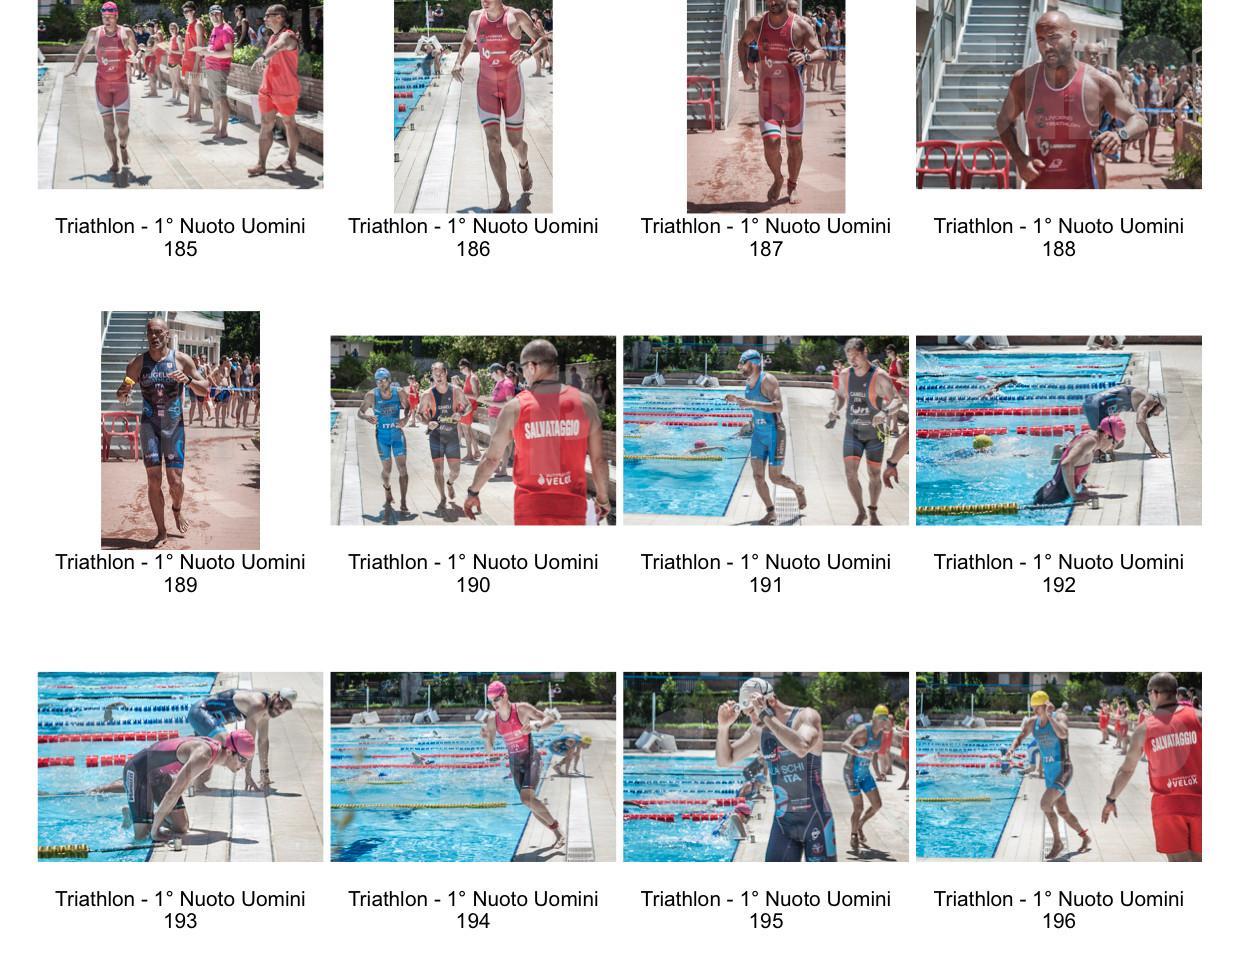 Triathlon_V.Elsa_-_1°_Frazione_Nuoto_Uomini_-10.jpg